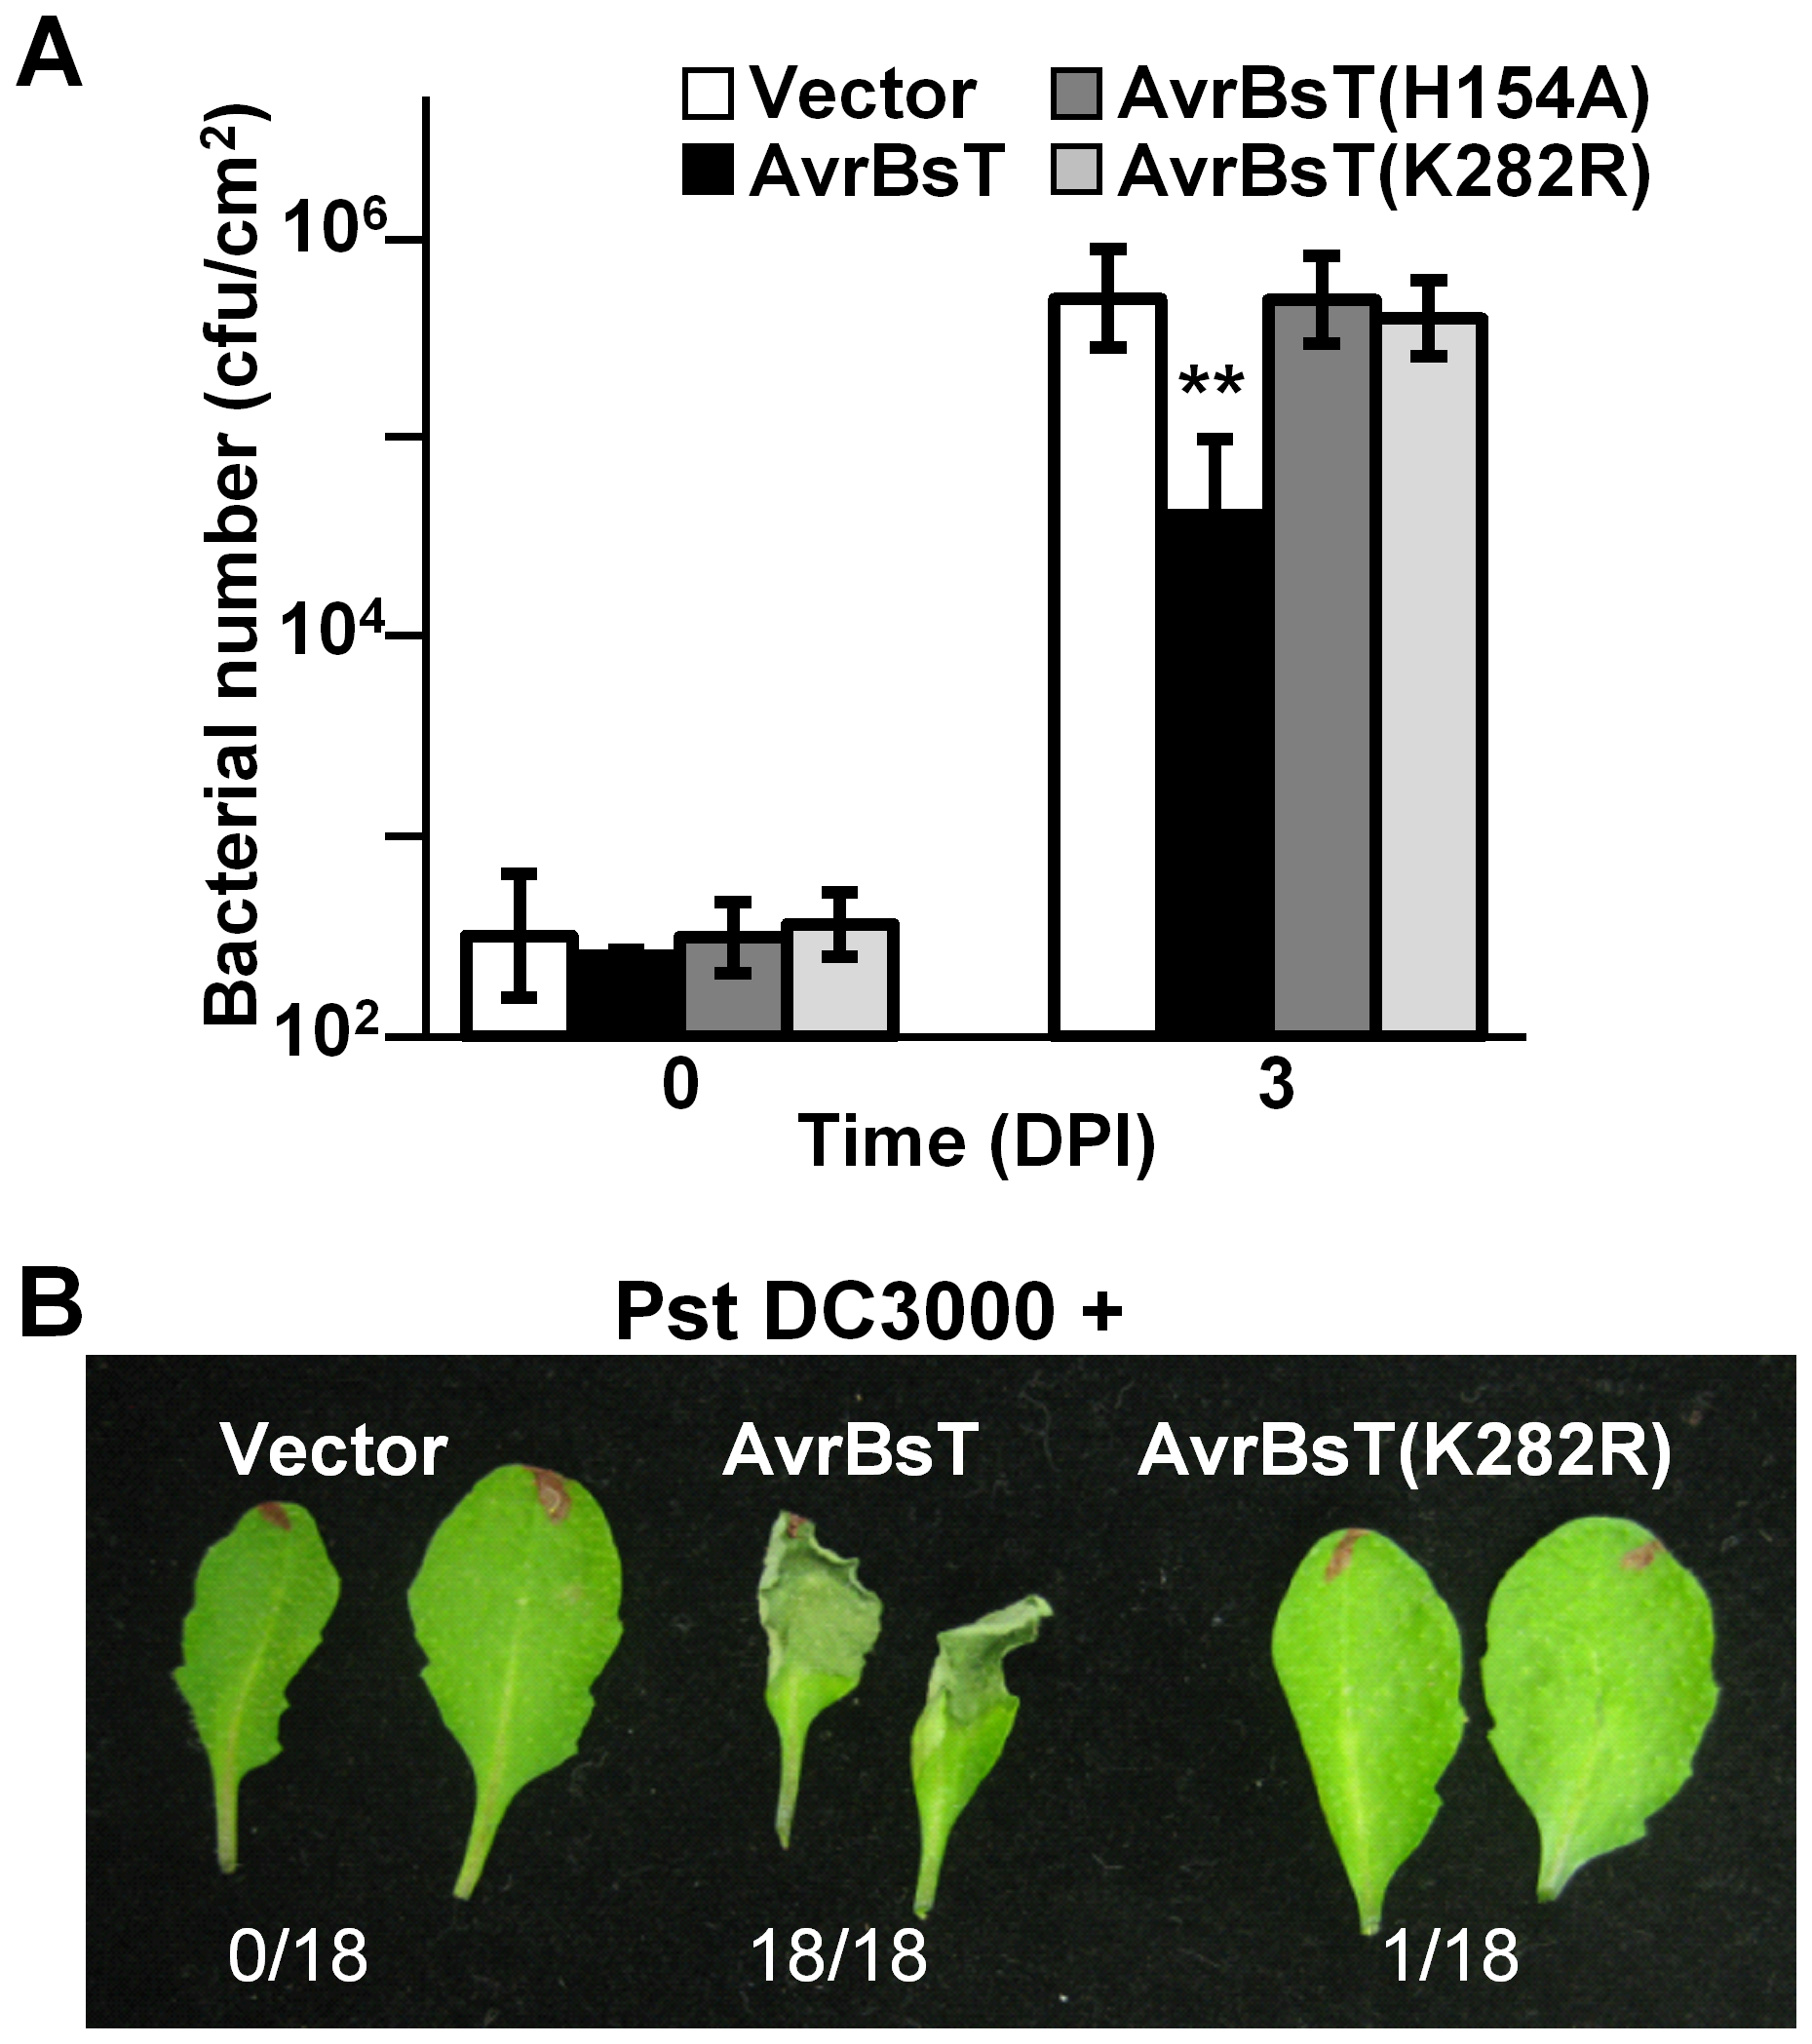 Mutation of K282 attenuates AvrBsT-triggered resistance.